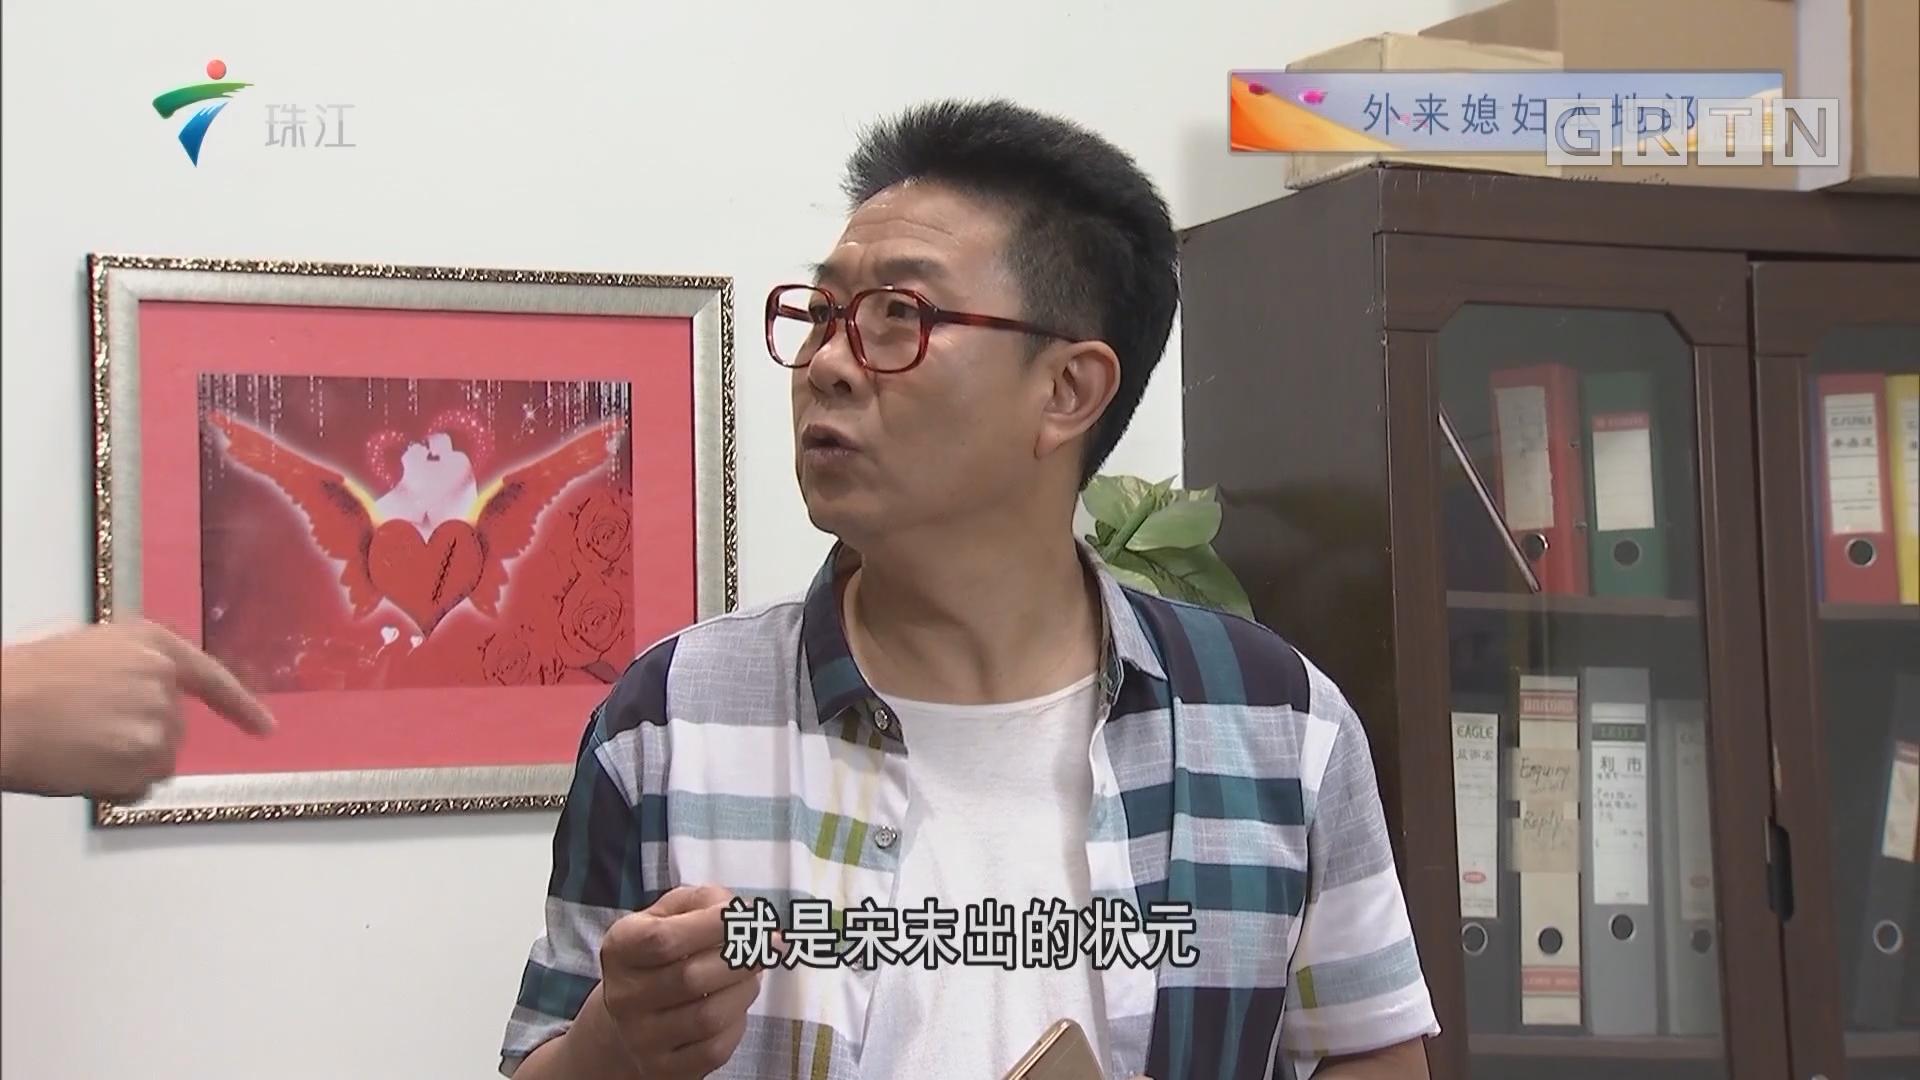 [HD][2018-11-18]外来媳妇本地郎:寻源状元村(上)